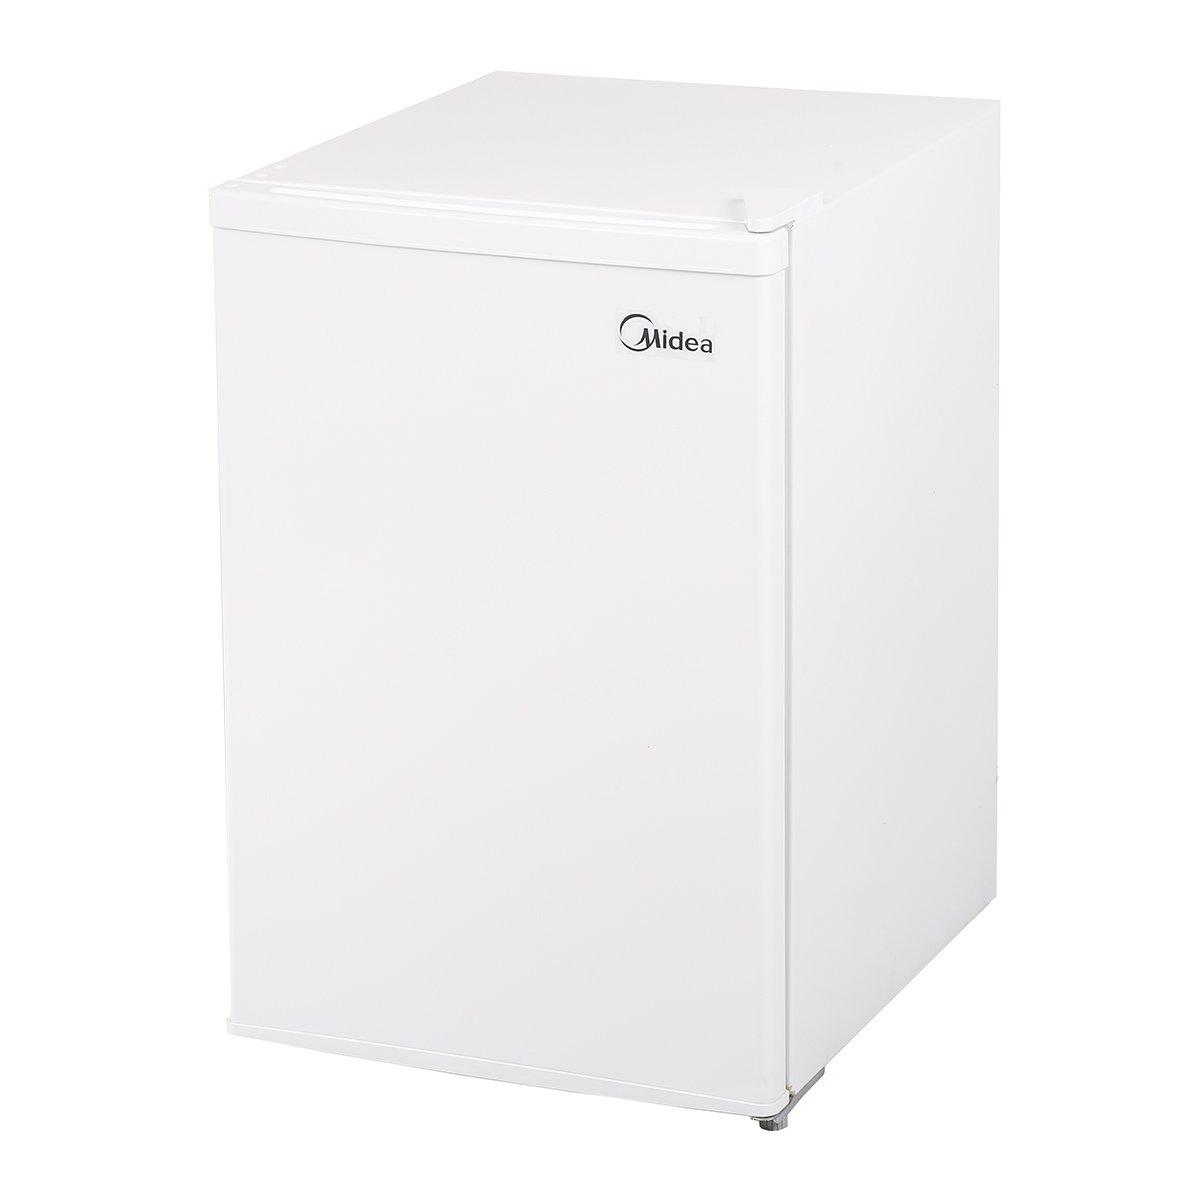 Midea stainless steel compact single reversible door upright freezers - Amazon Com Midea Whs 52fw1 Compact Single Reversible Door Upright Freezer 1 1 Cubic Feet White Appliances